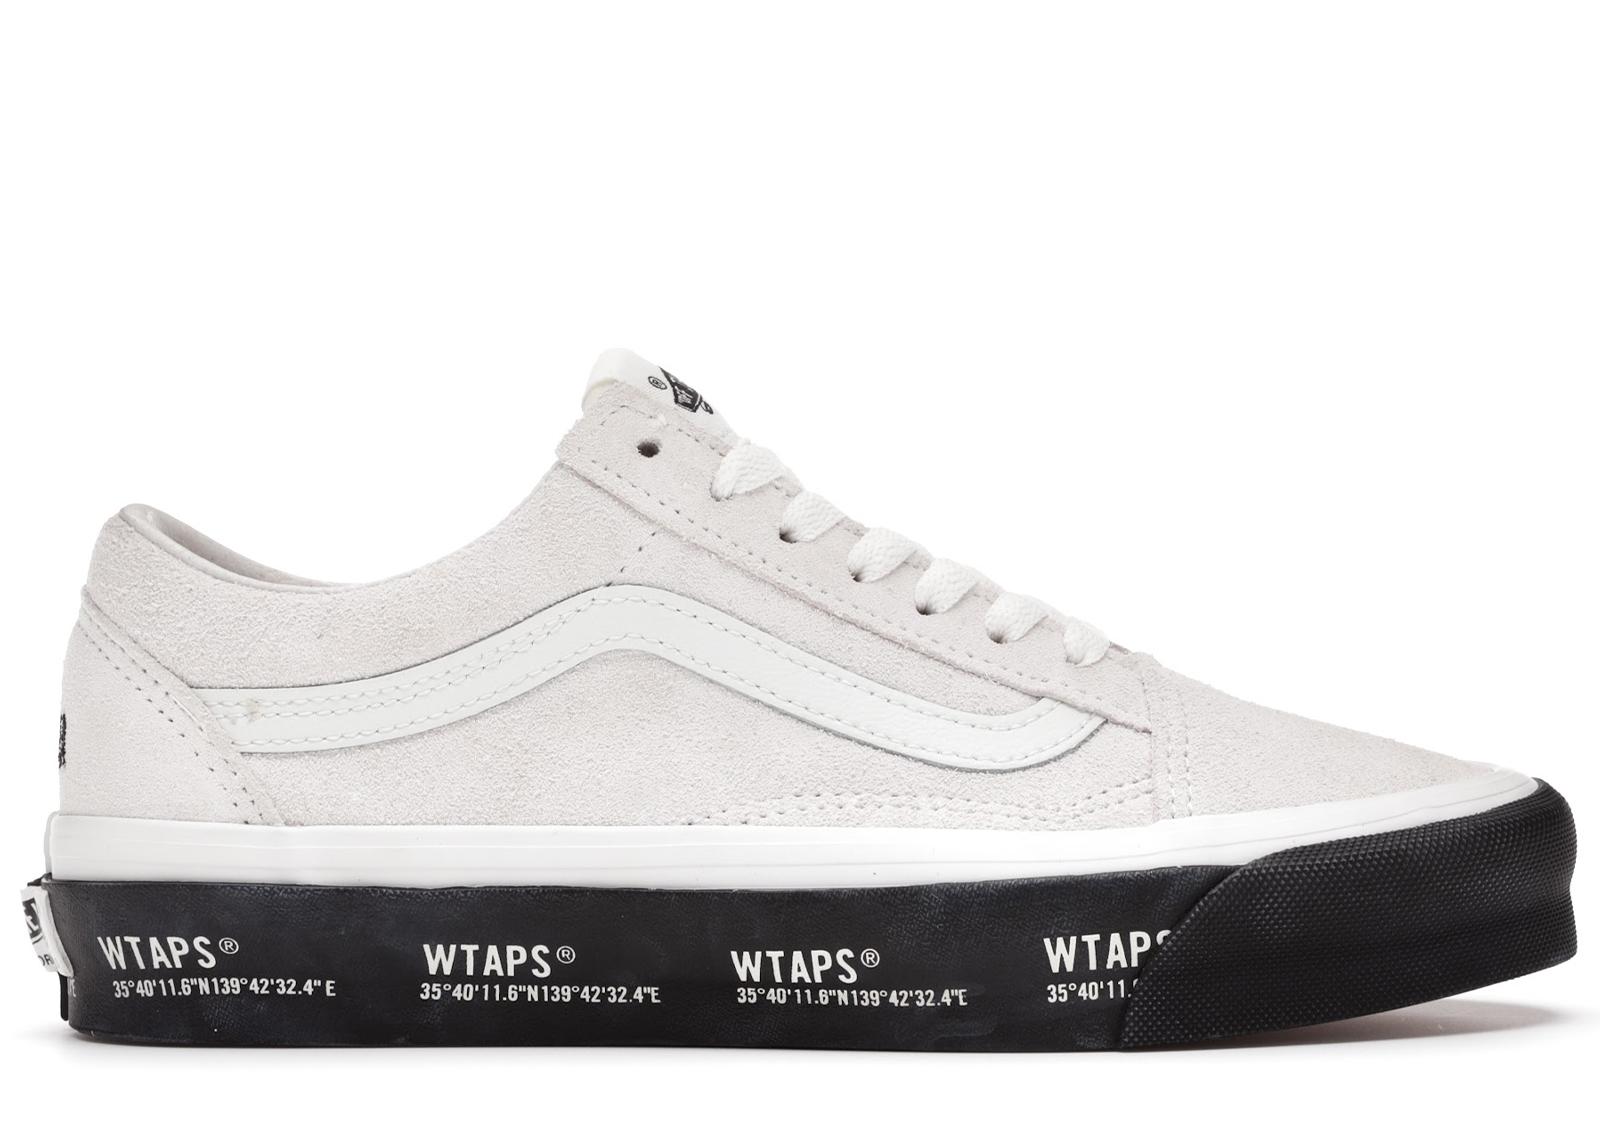 Vans Old Skool WTAPS White Black - VN0A4P3X20F